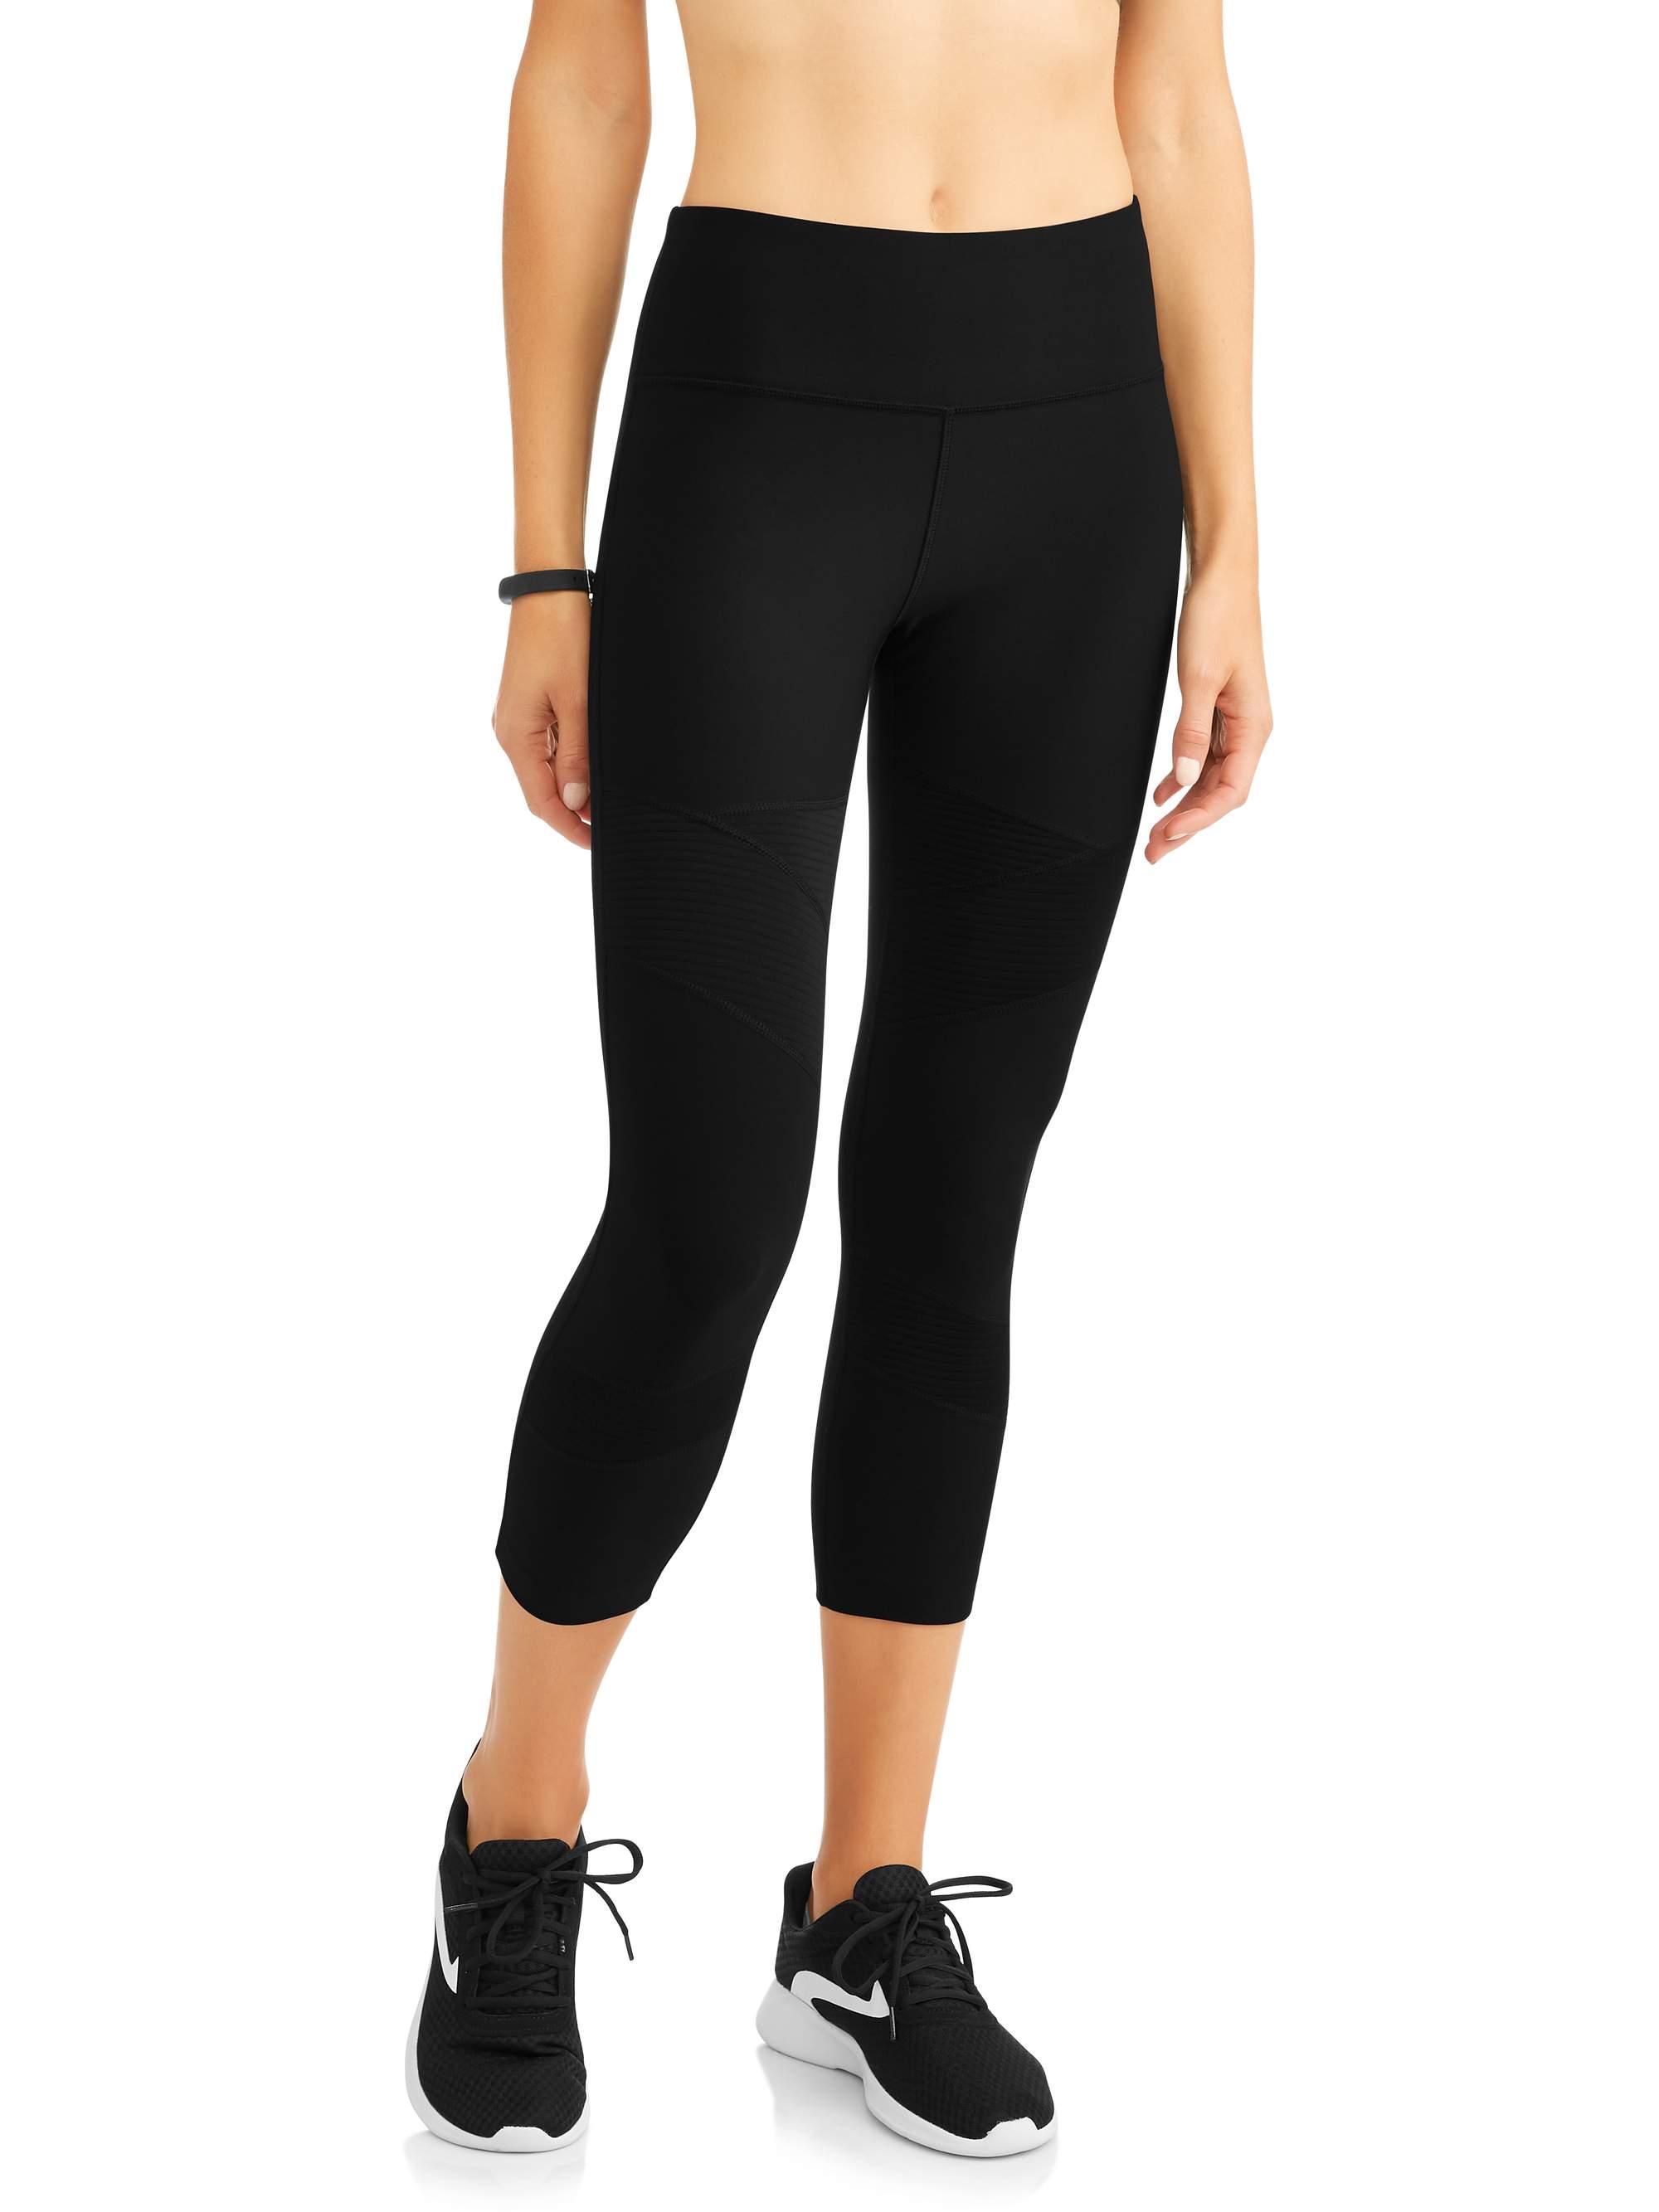 e95272a37dd Check Inventory. Avia Women s Active Mesh Insert Performance Capri Leggings